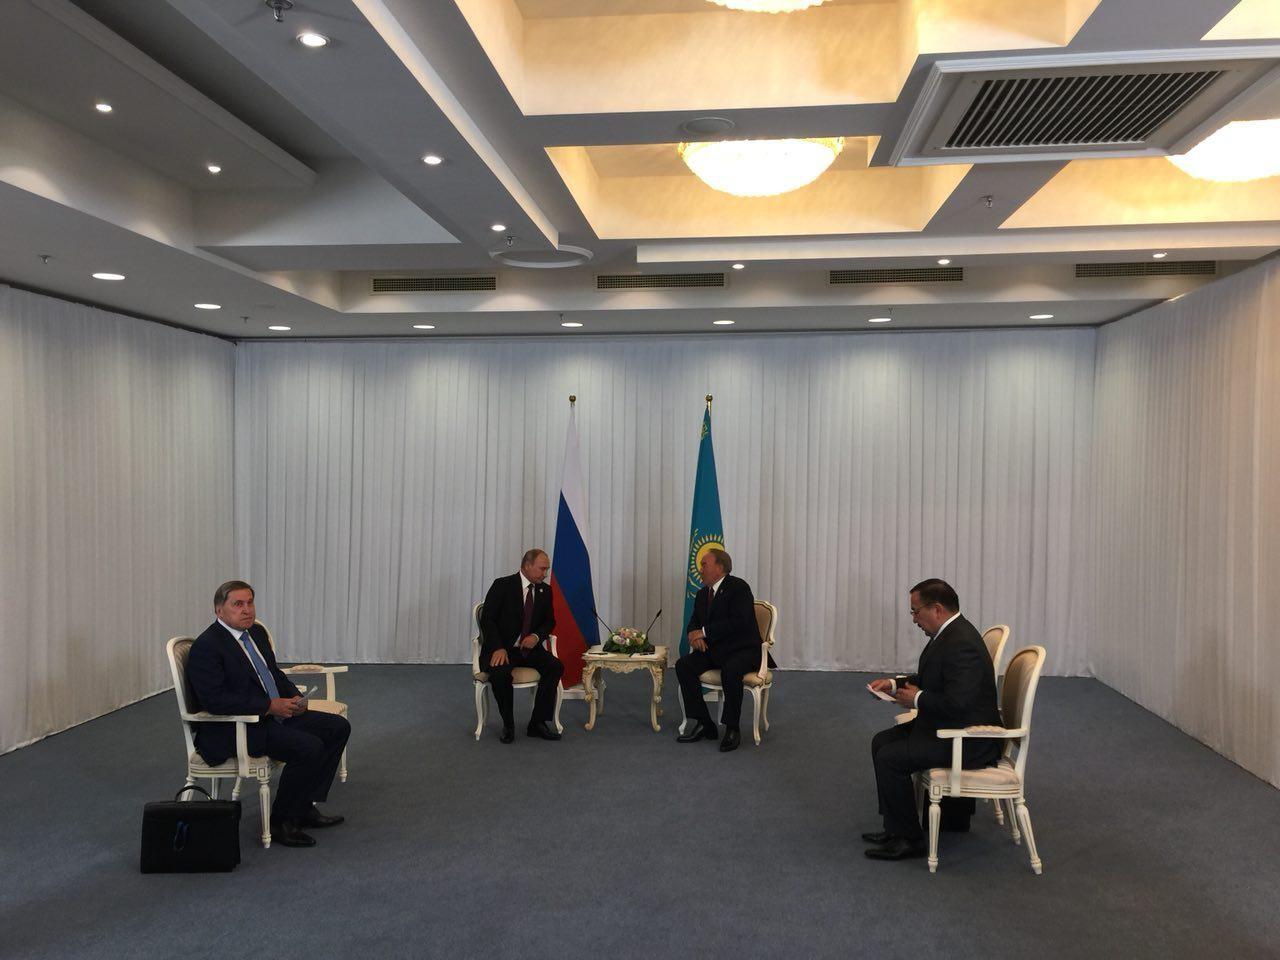 Встреча Владимира Путина и Нурсултана Назарбаева. Фото: ©L!FE/Павел Баранов